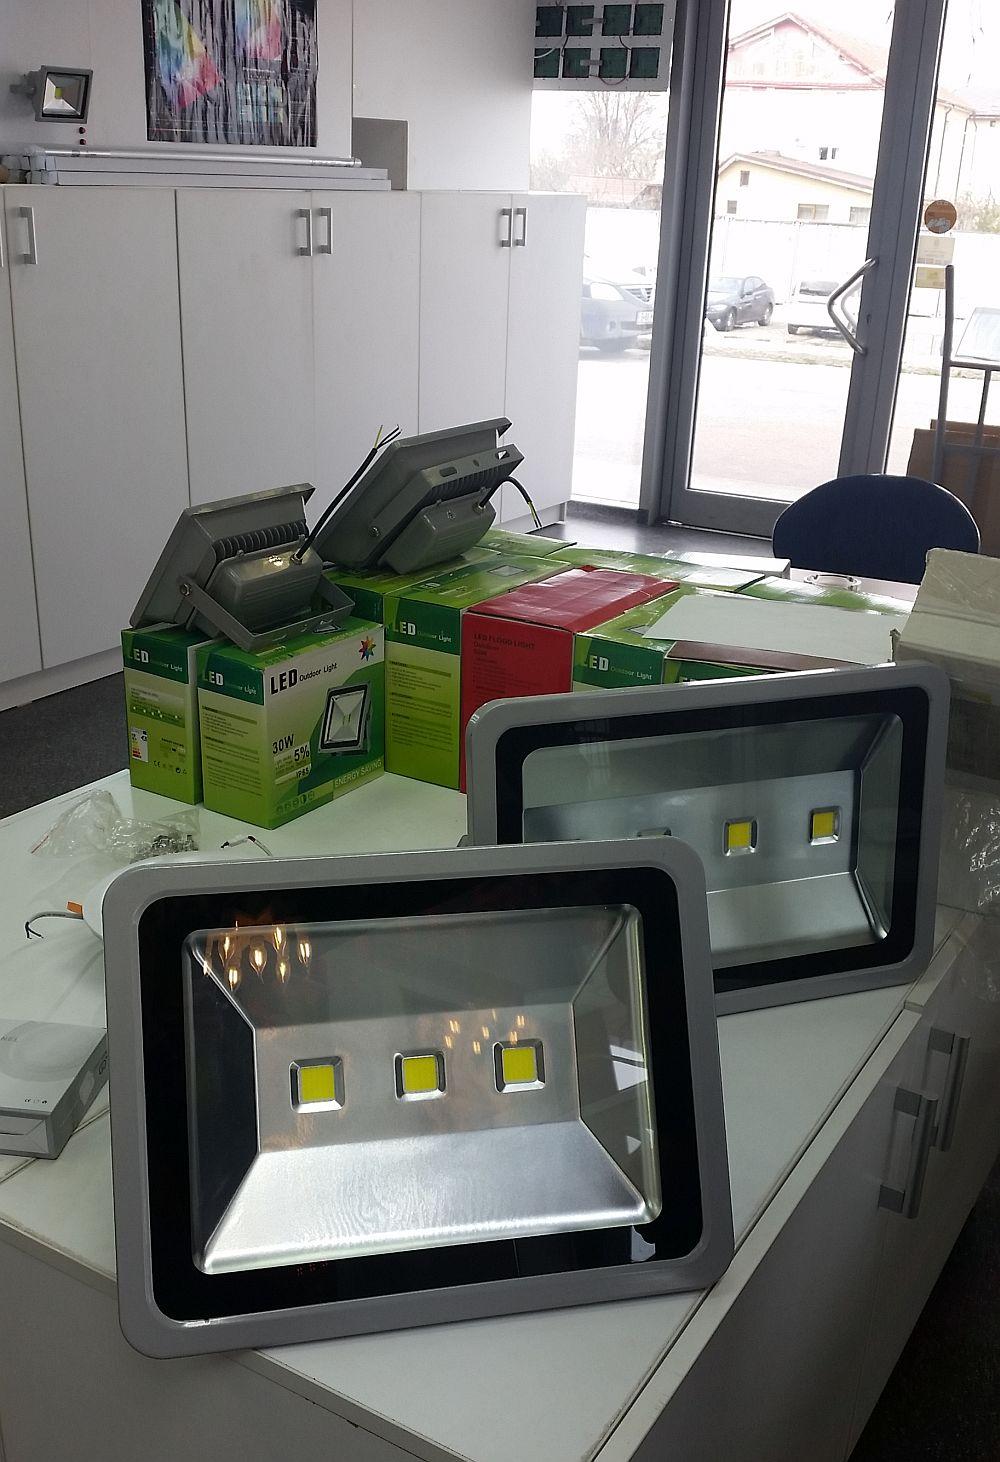 adelaparvu.com despre becuri LED asamblate in Romania, Global Flash Media (17)